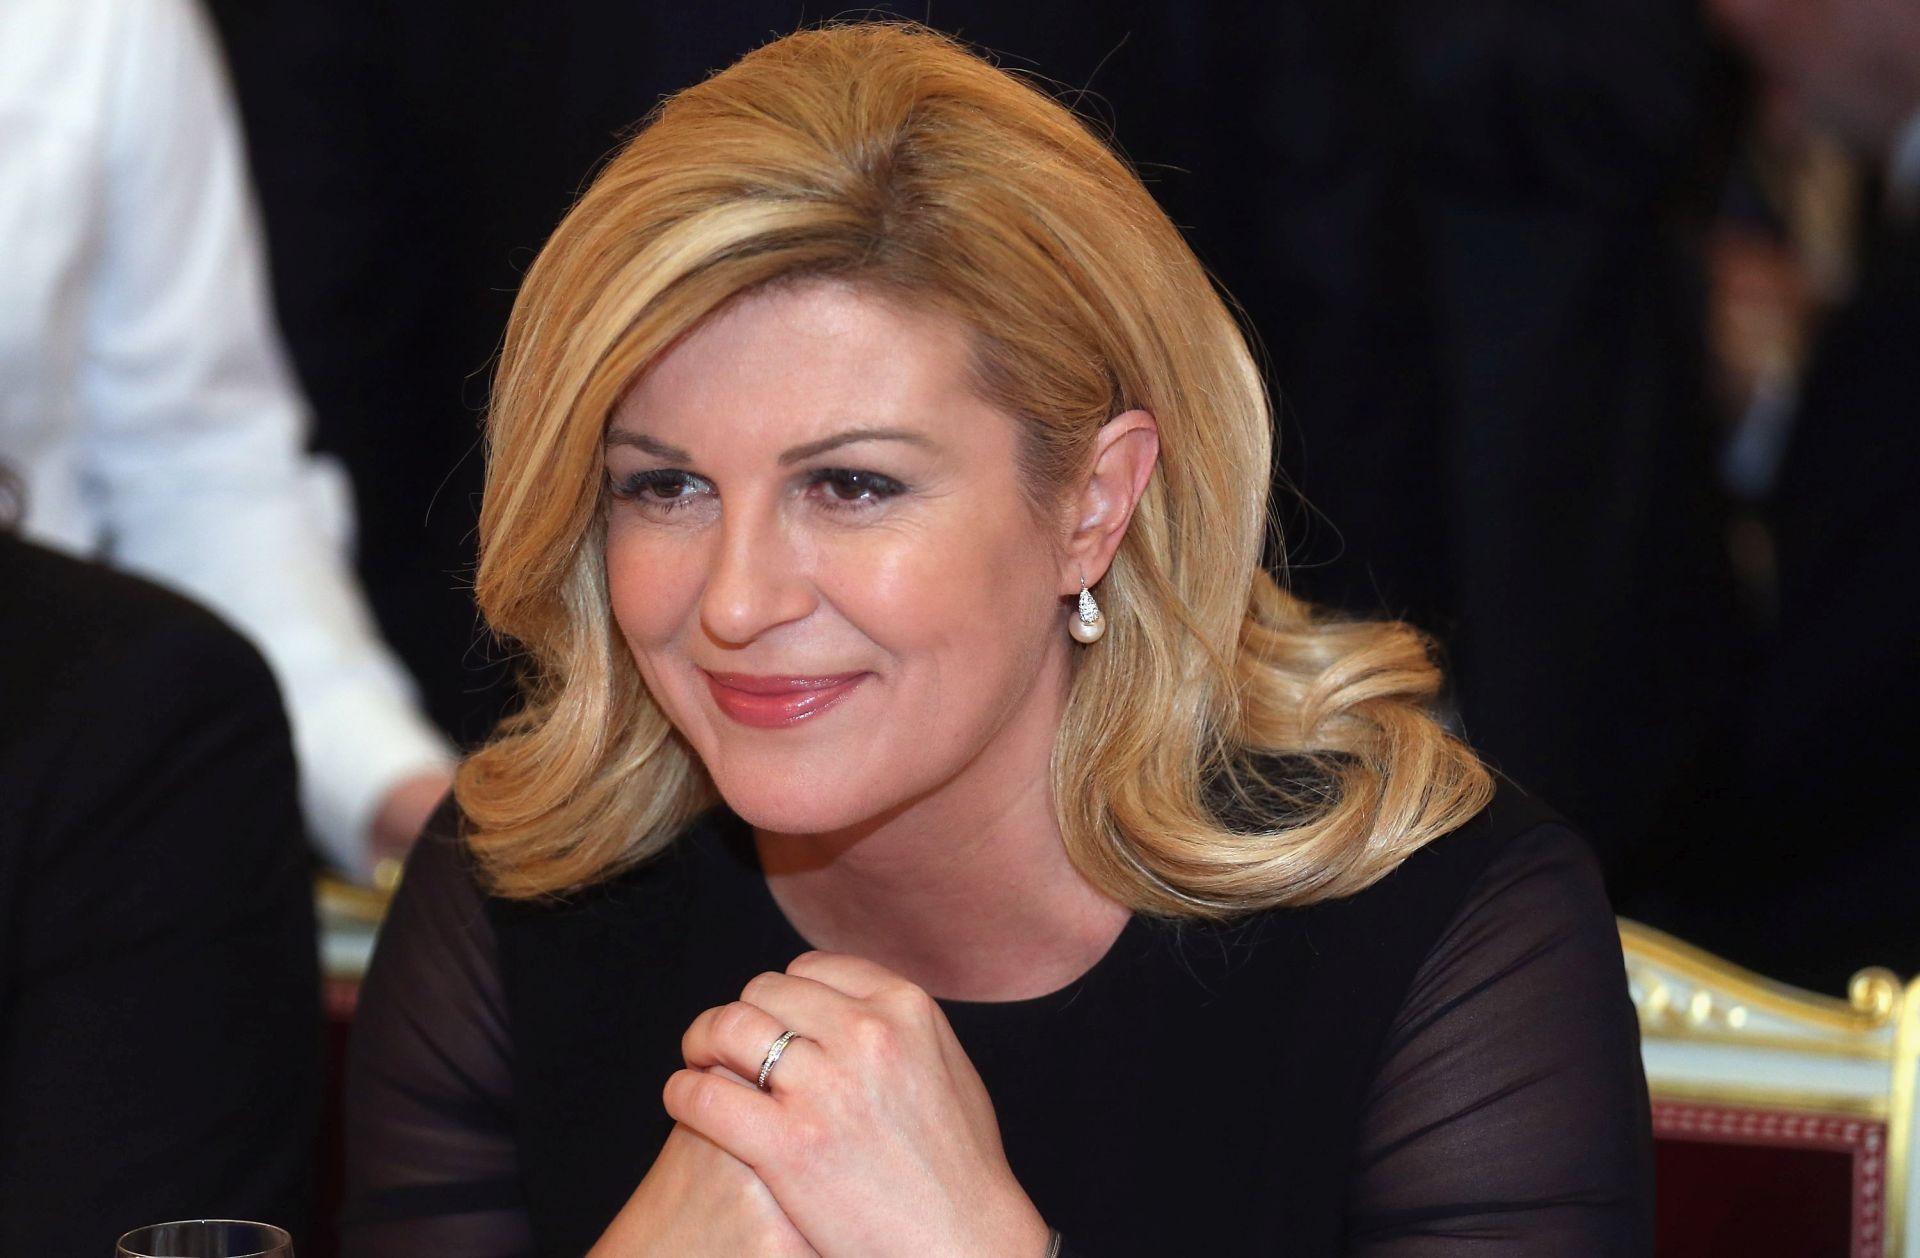 Predsjednica Grabar Kitarović odlikovala Milku Zadro